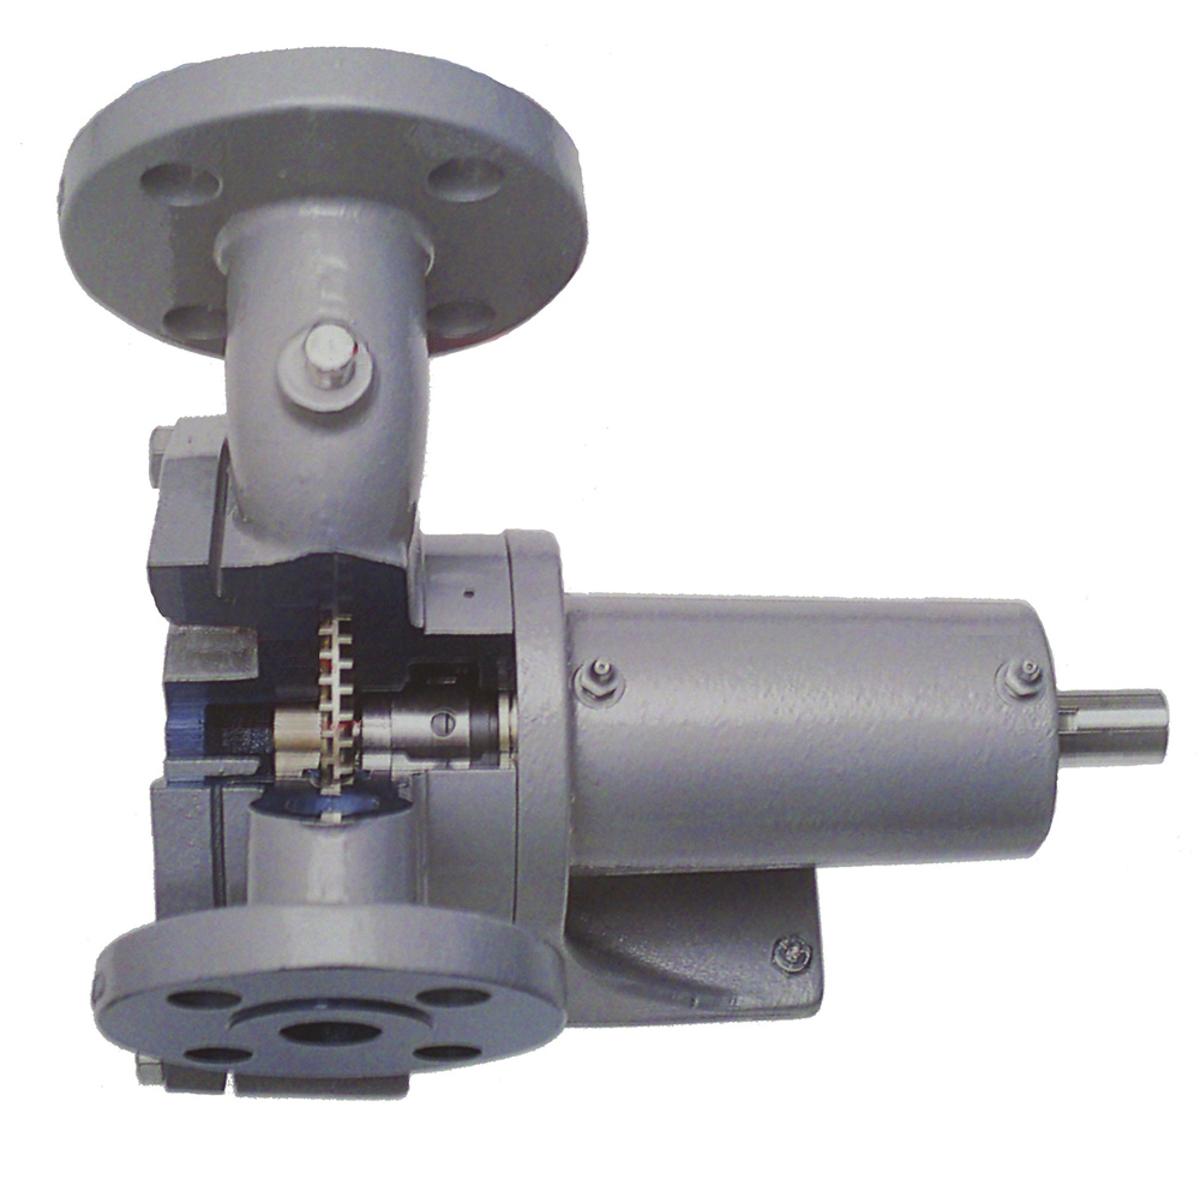 CORKEN Pumps DLD150MDA with Connetror